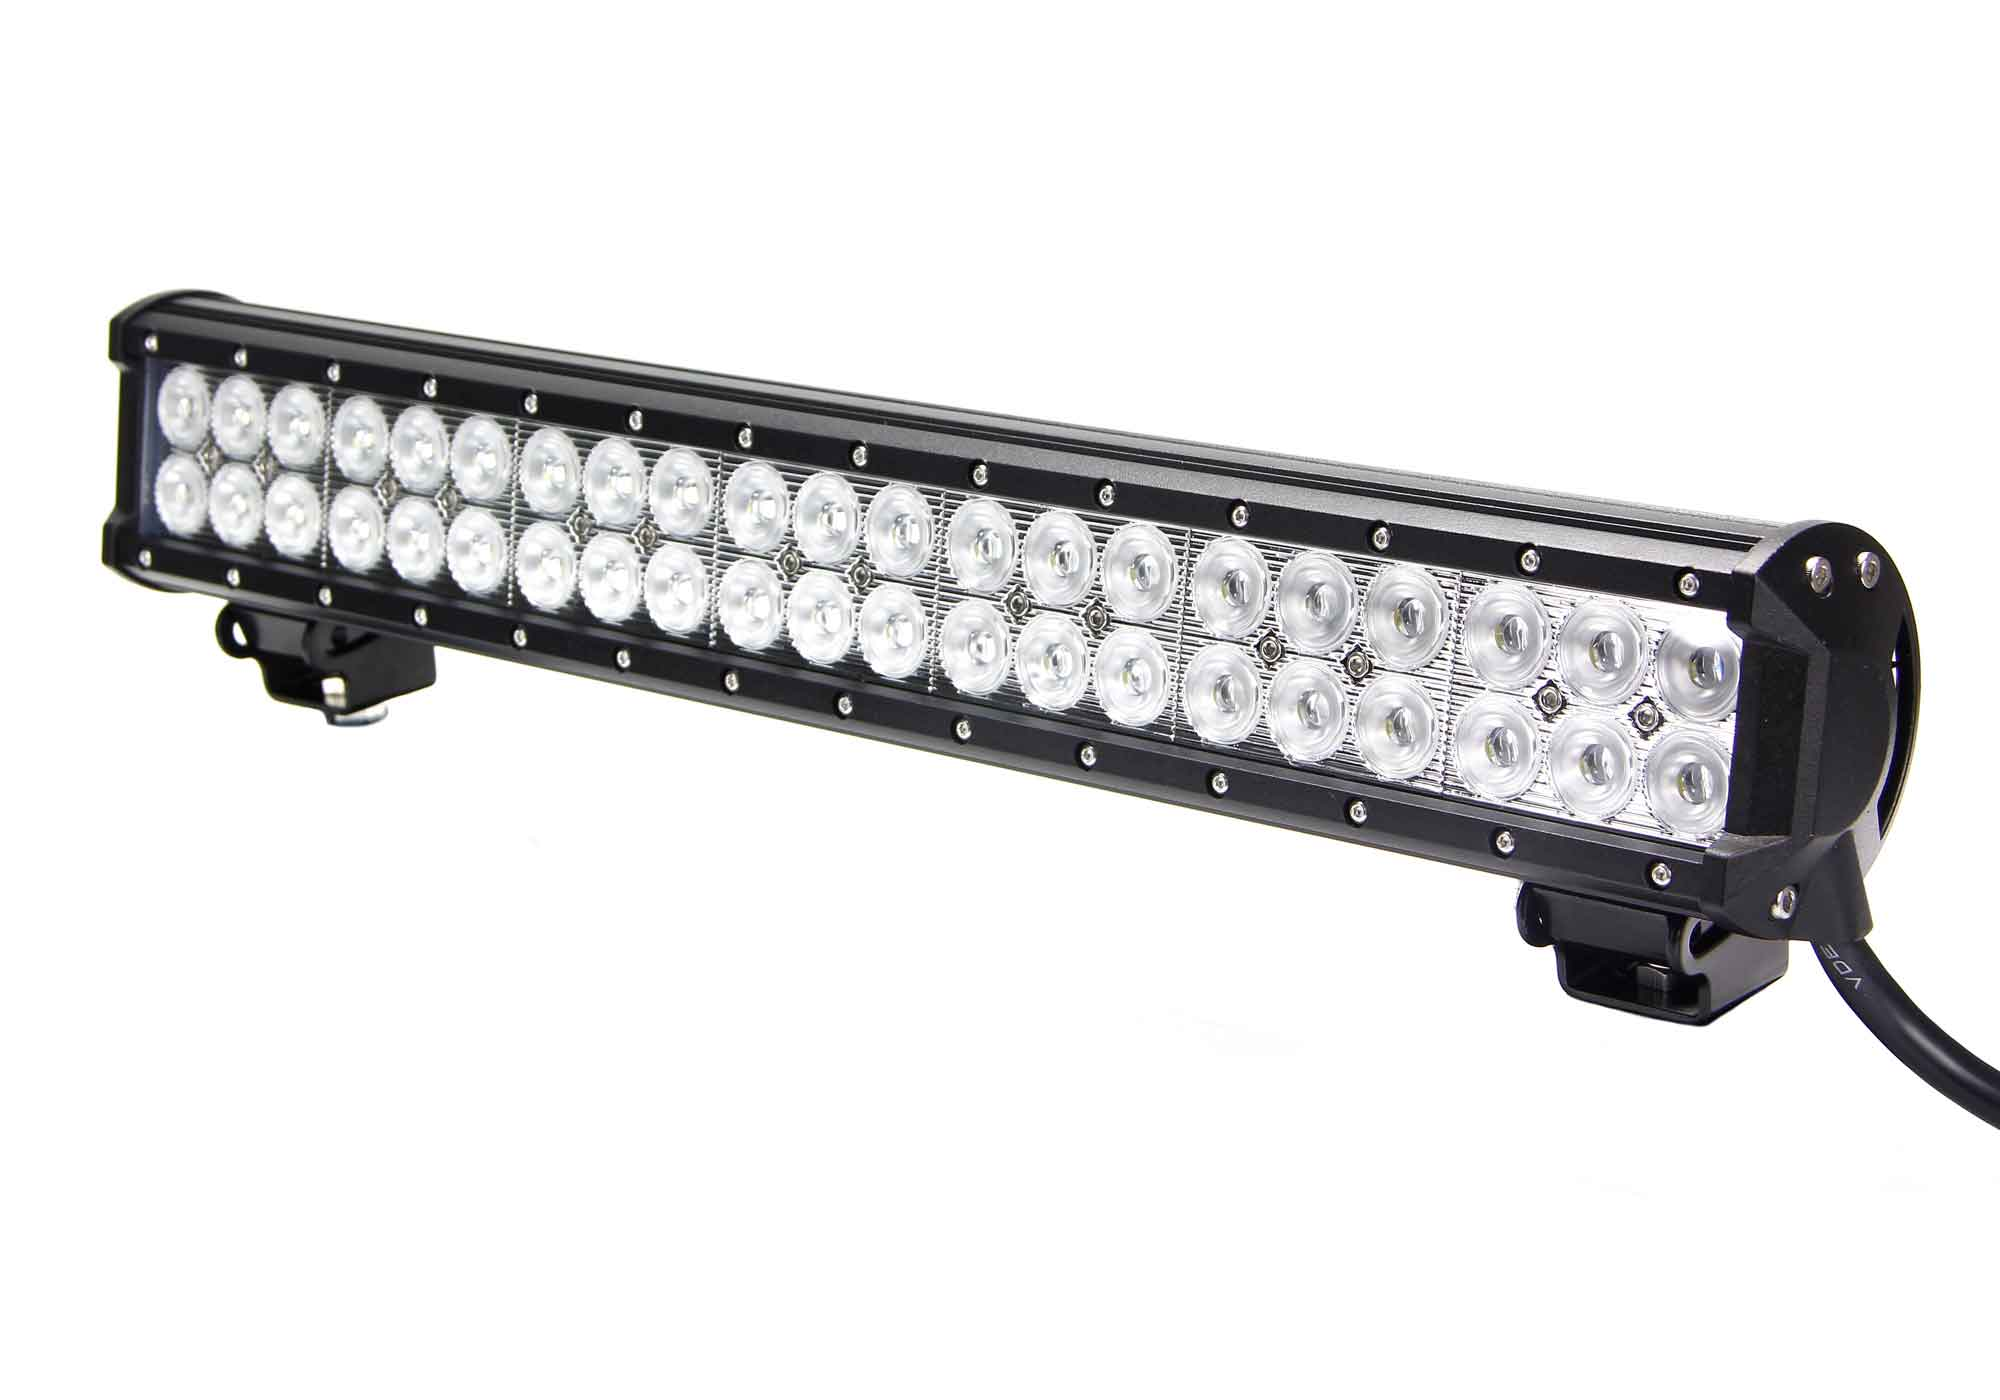 Vortex Series Led Light Bar